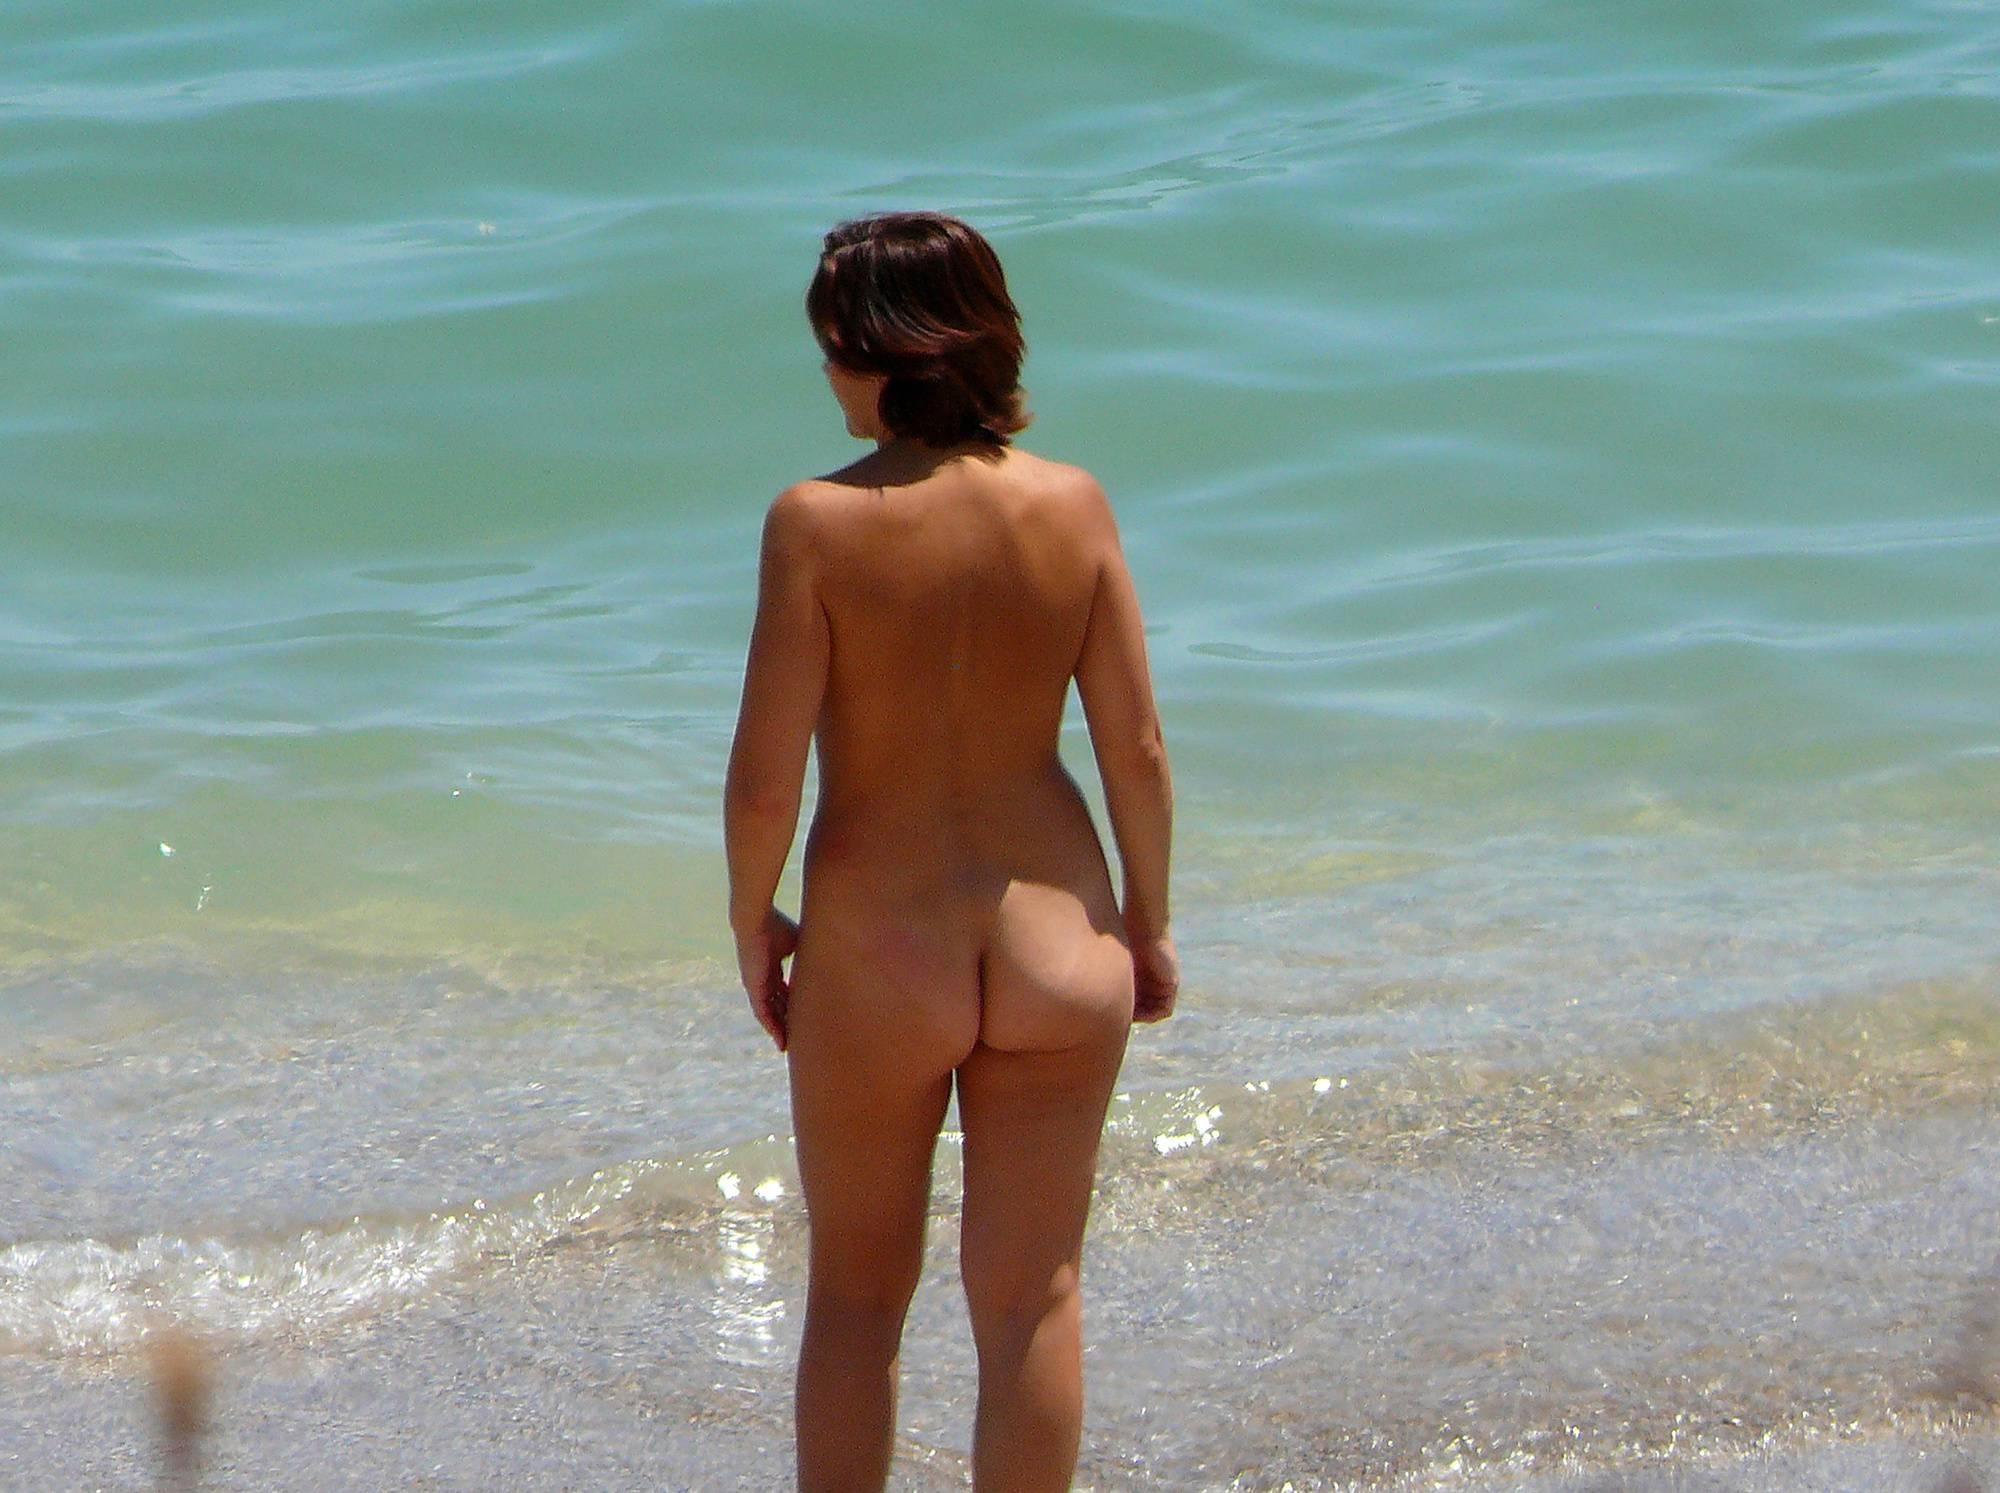 Romanian Beach Waters - 1